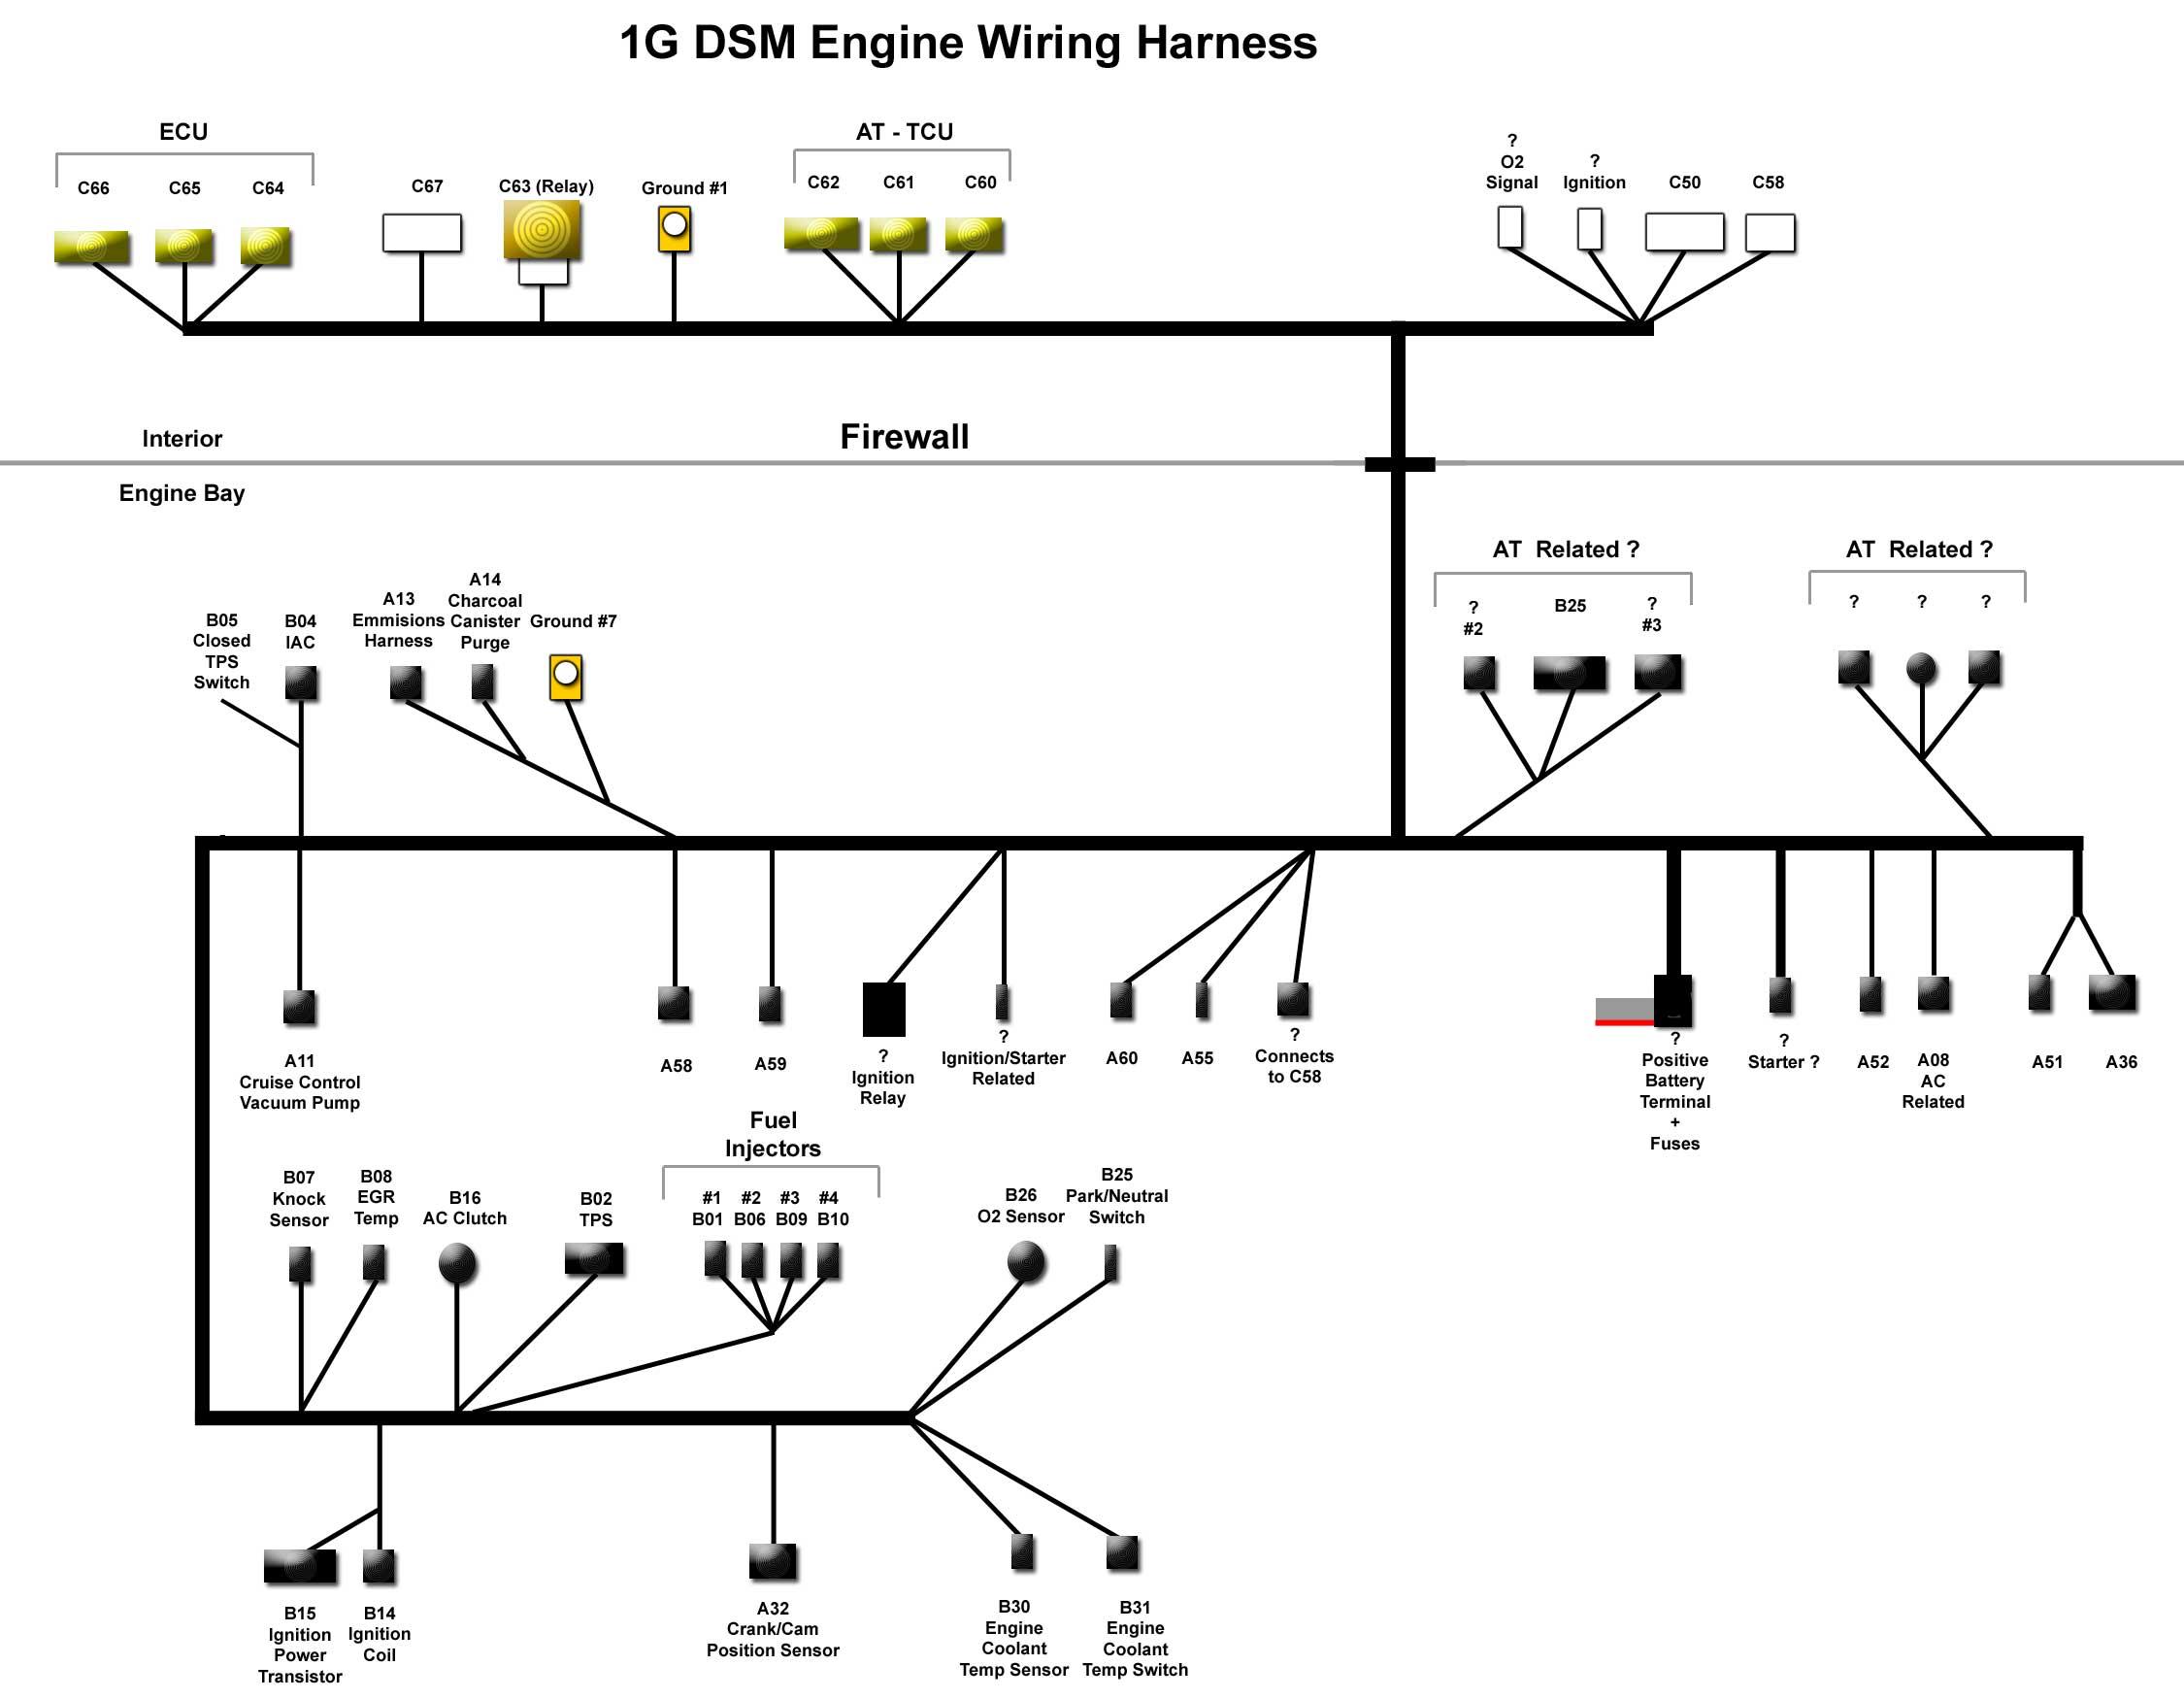 1G DSM EngineHarness?resize=665%2C517 ford ka alternator wiring diagram wiring diagram ford ka alternator wiring diagram at gsmportal.co